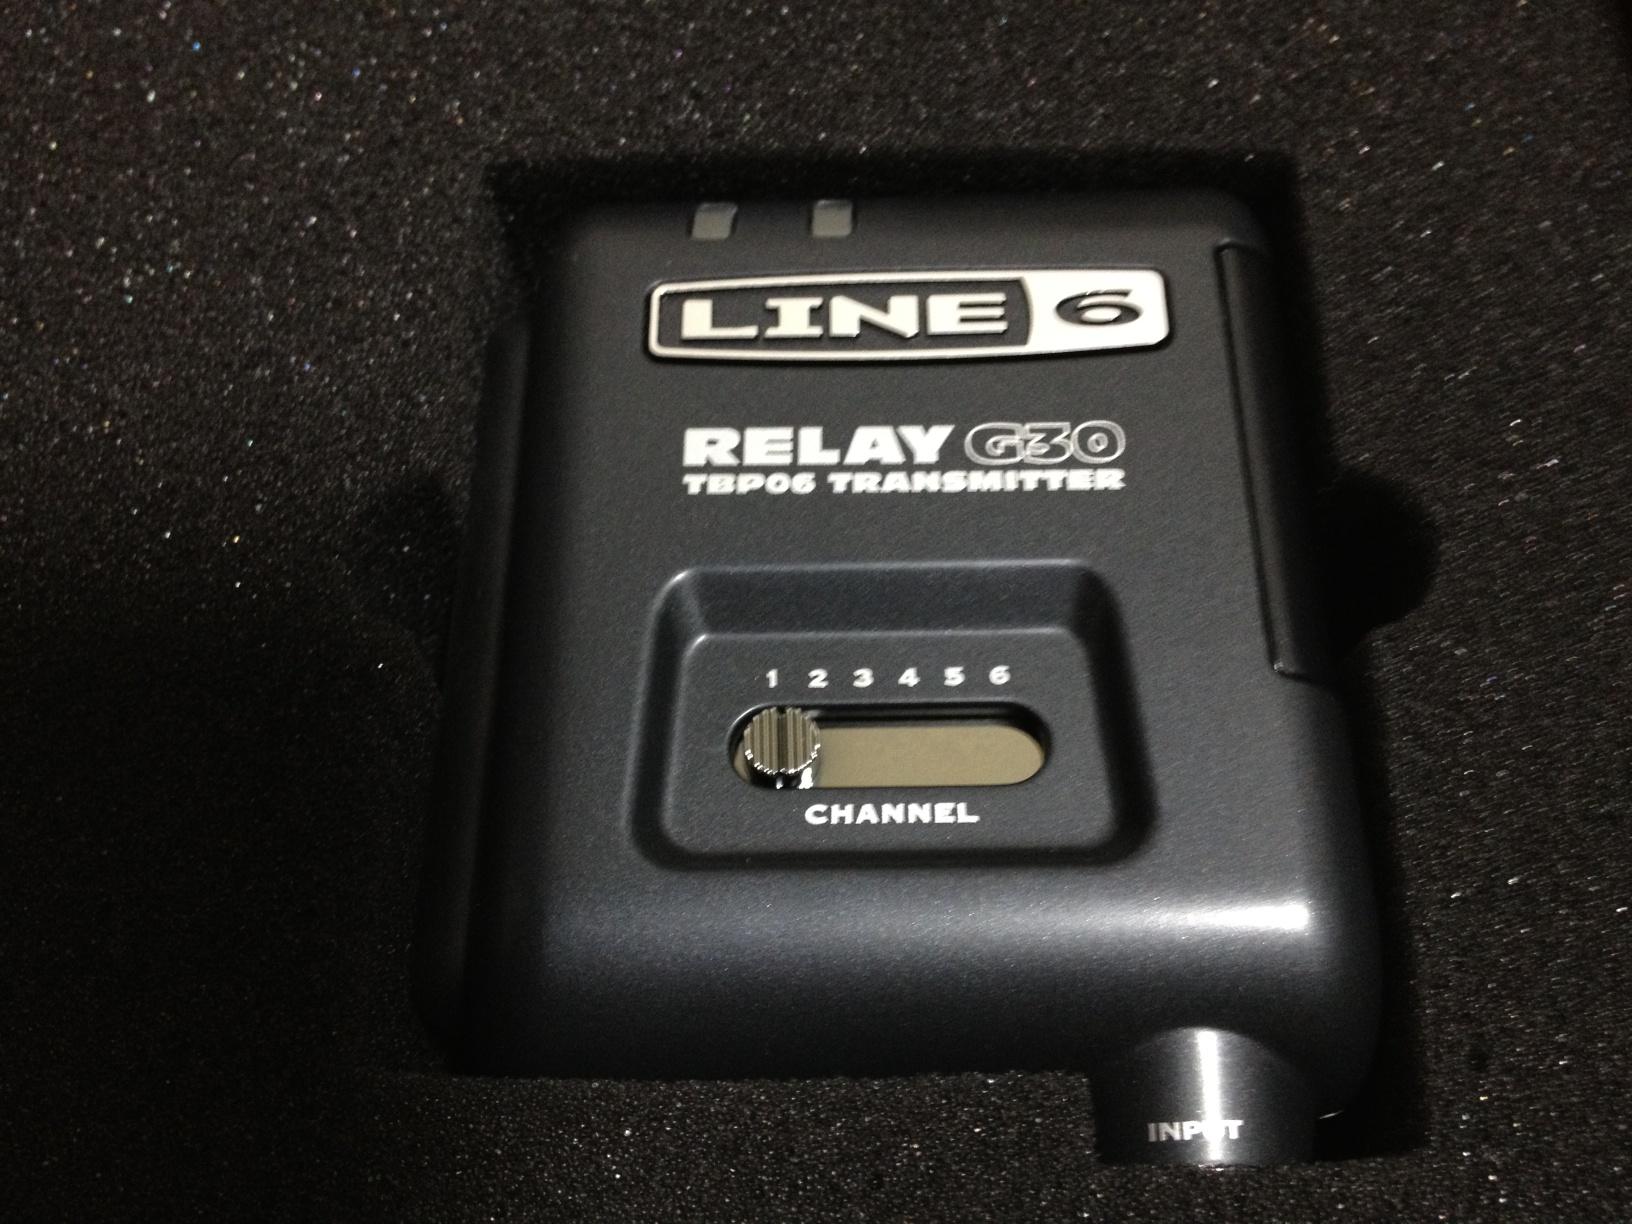 Line6 Relay G30